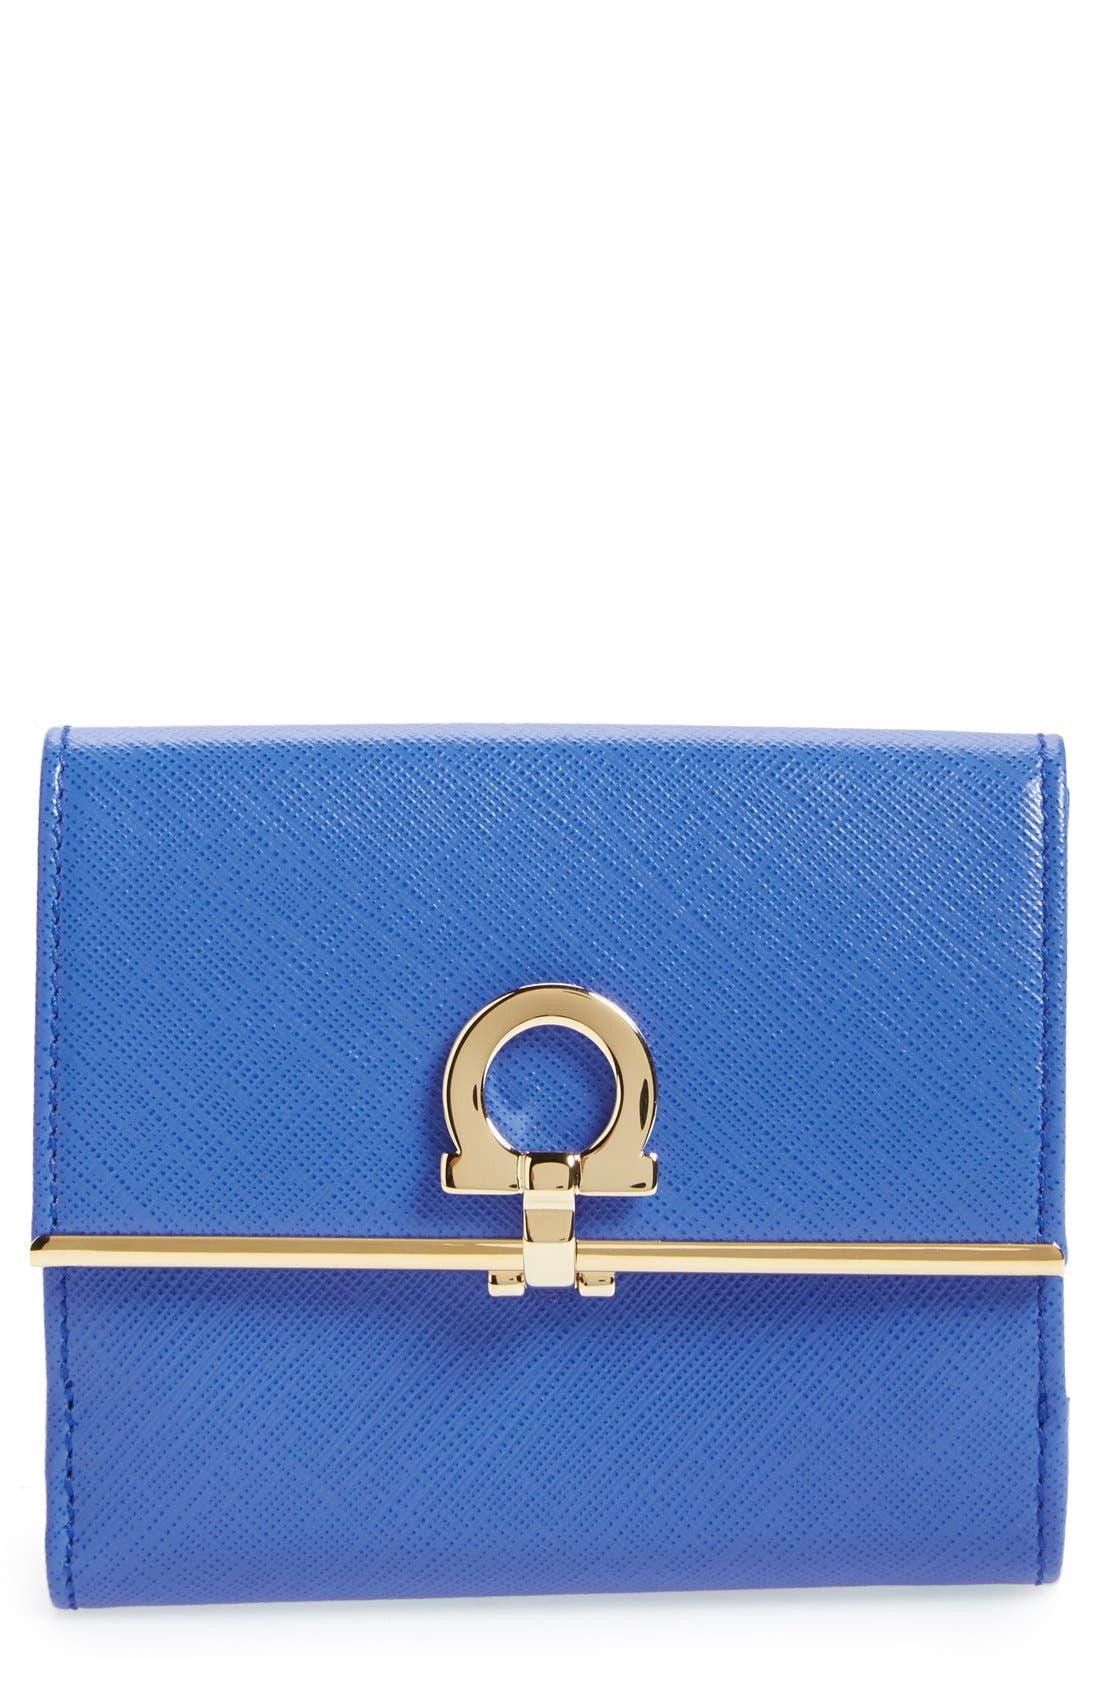 Alternate Image 1 Selected - Salvatore Ferragamo Saffiano Calfskin Leather Wallet